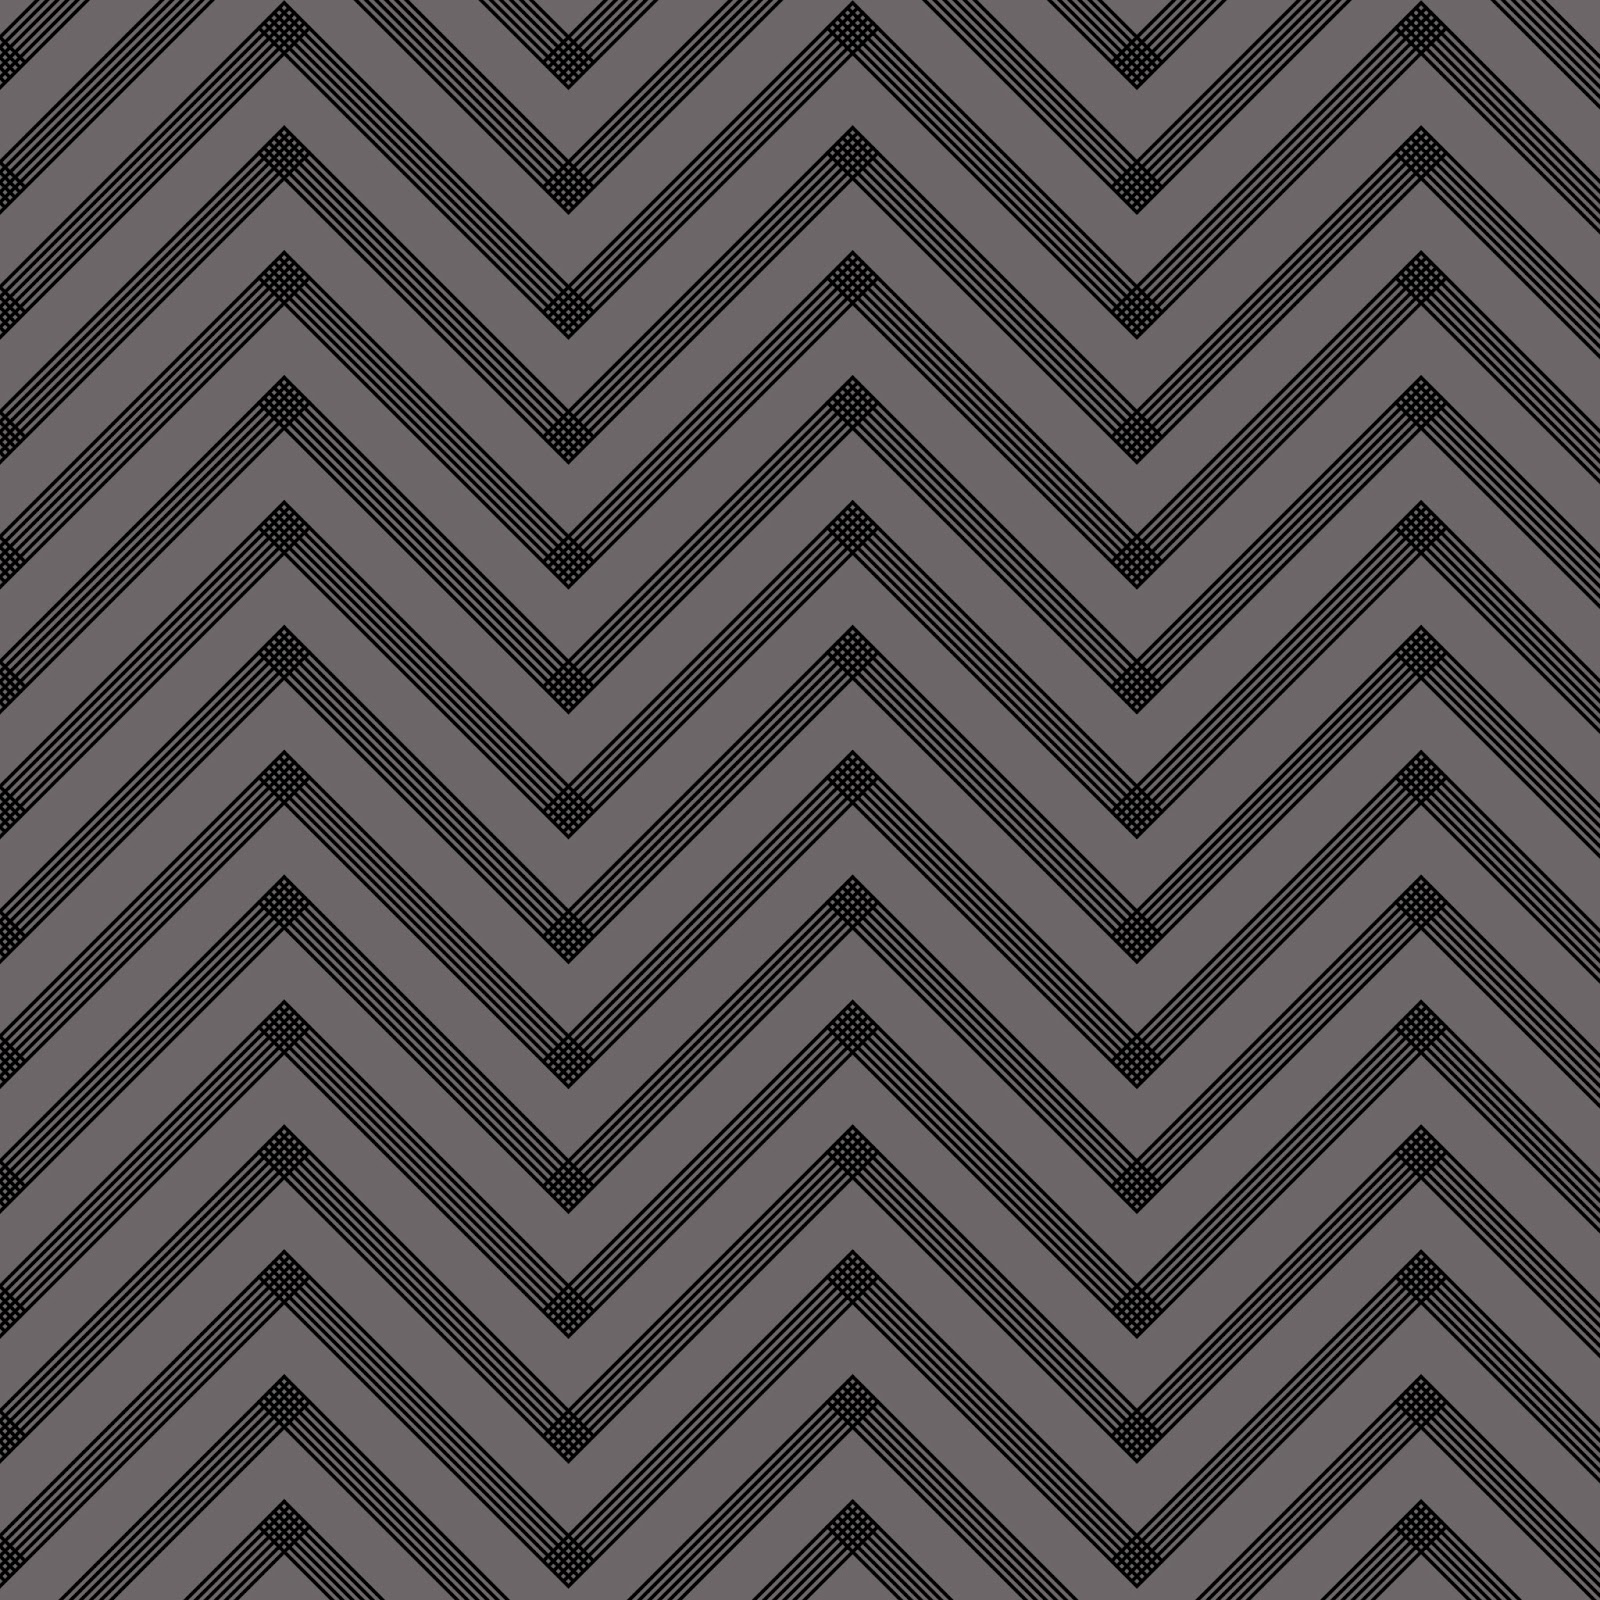 Chevron Wallpaper Gray Wallpapersafari